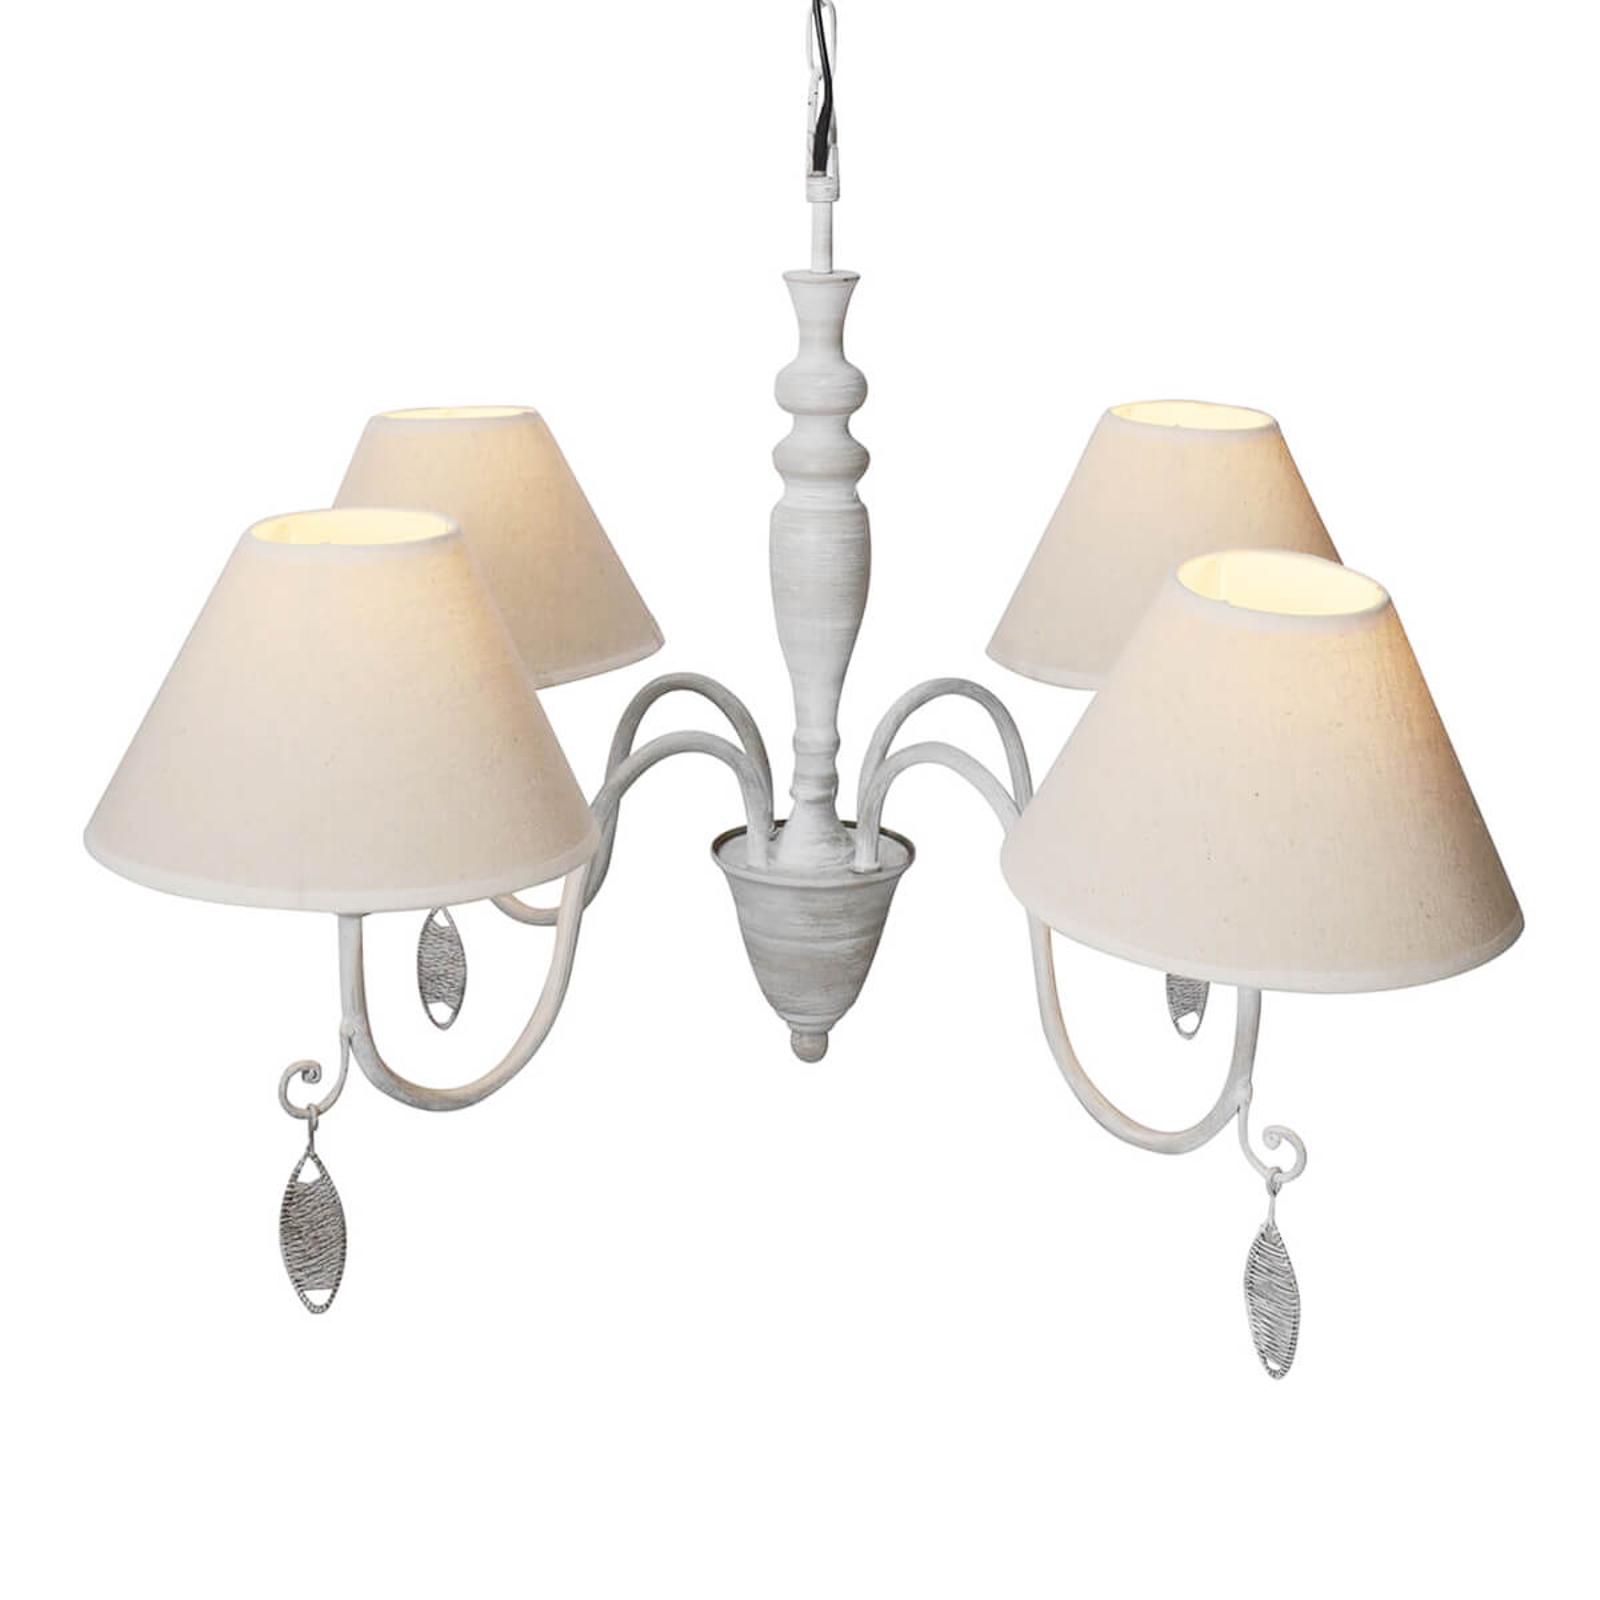 4-punktowa lampa wisząca Merle – tekstylne klosze